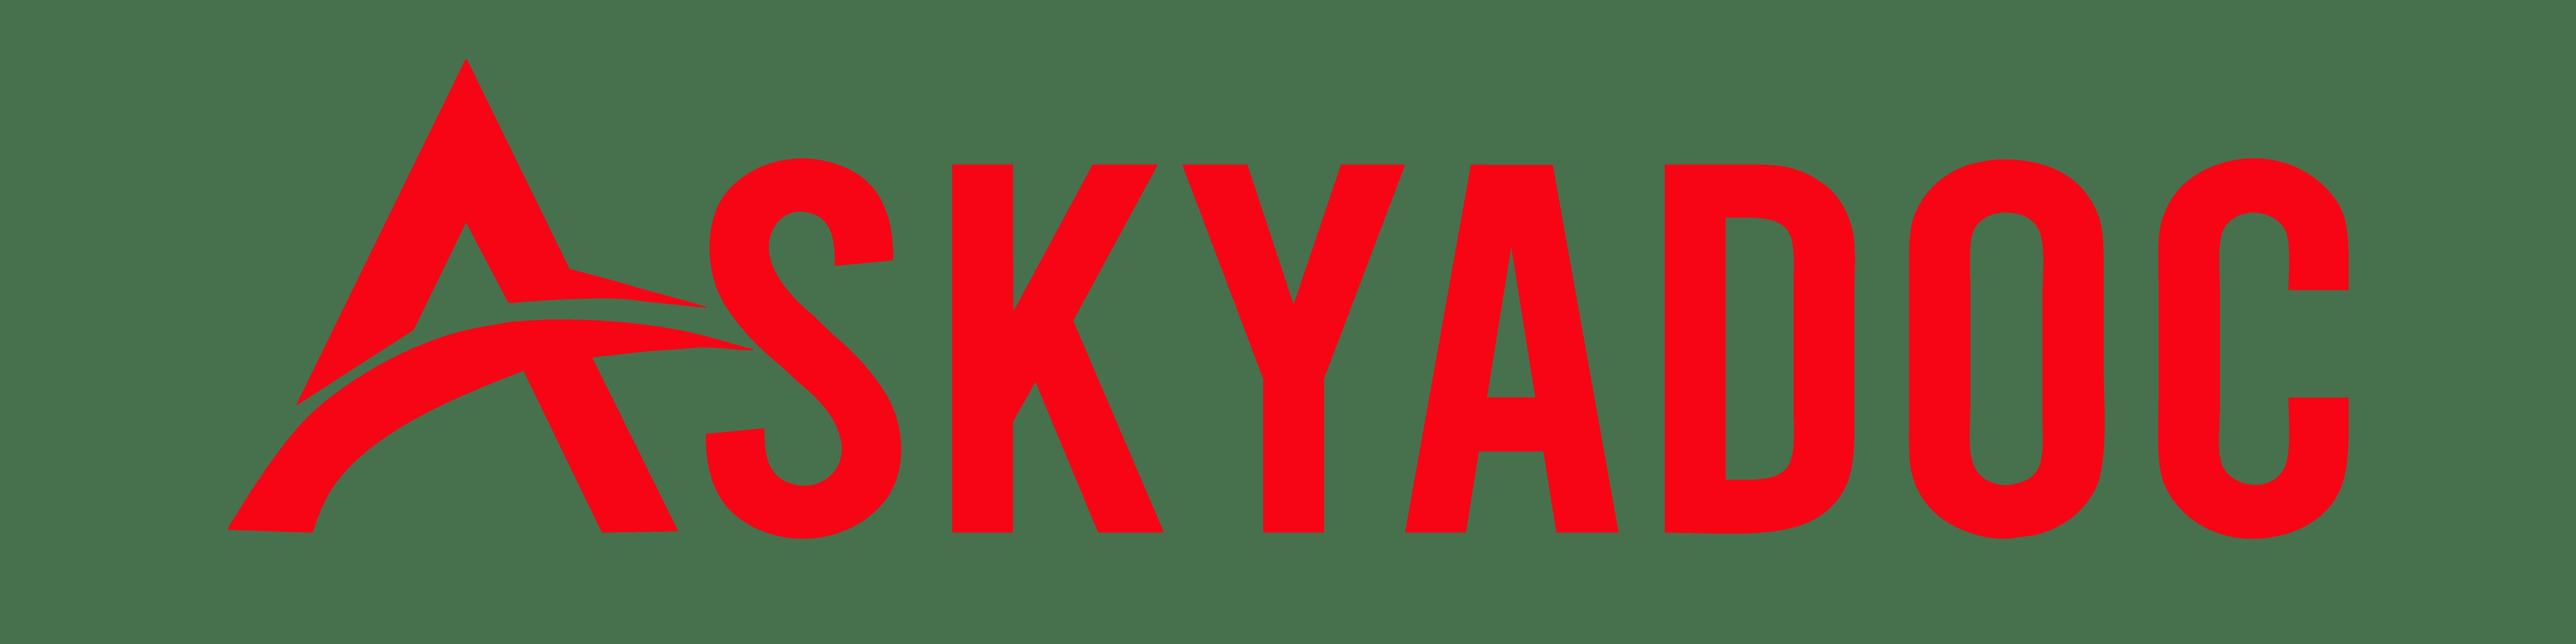 AskYaDoc